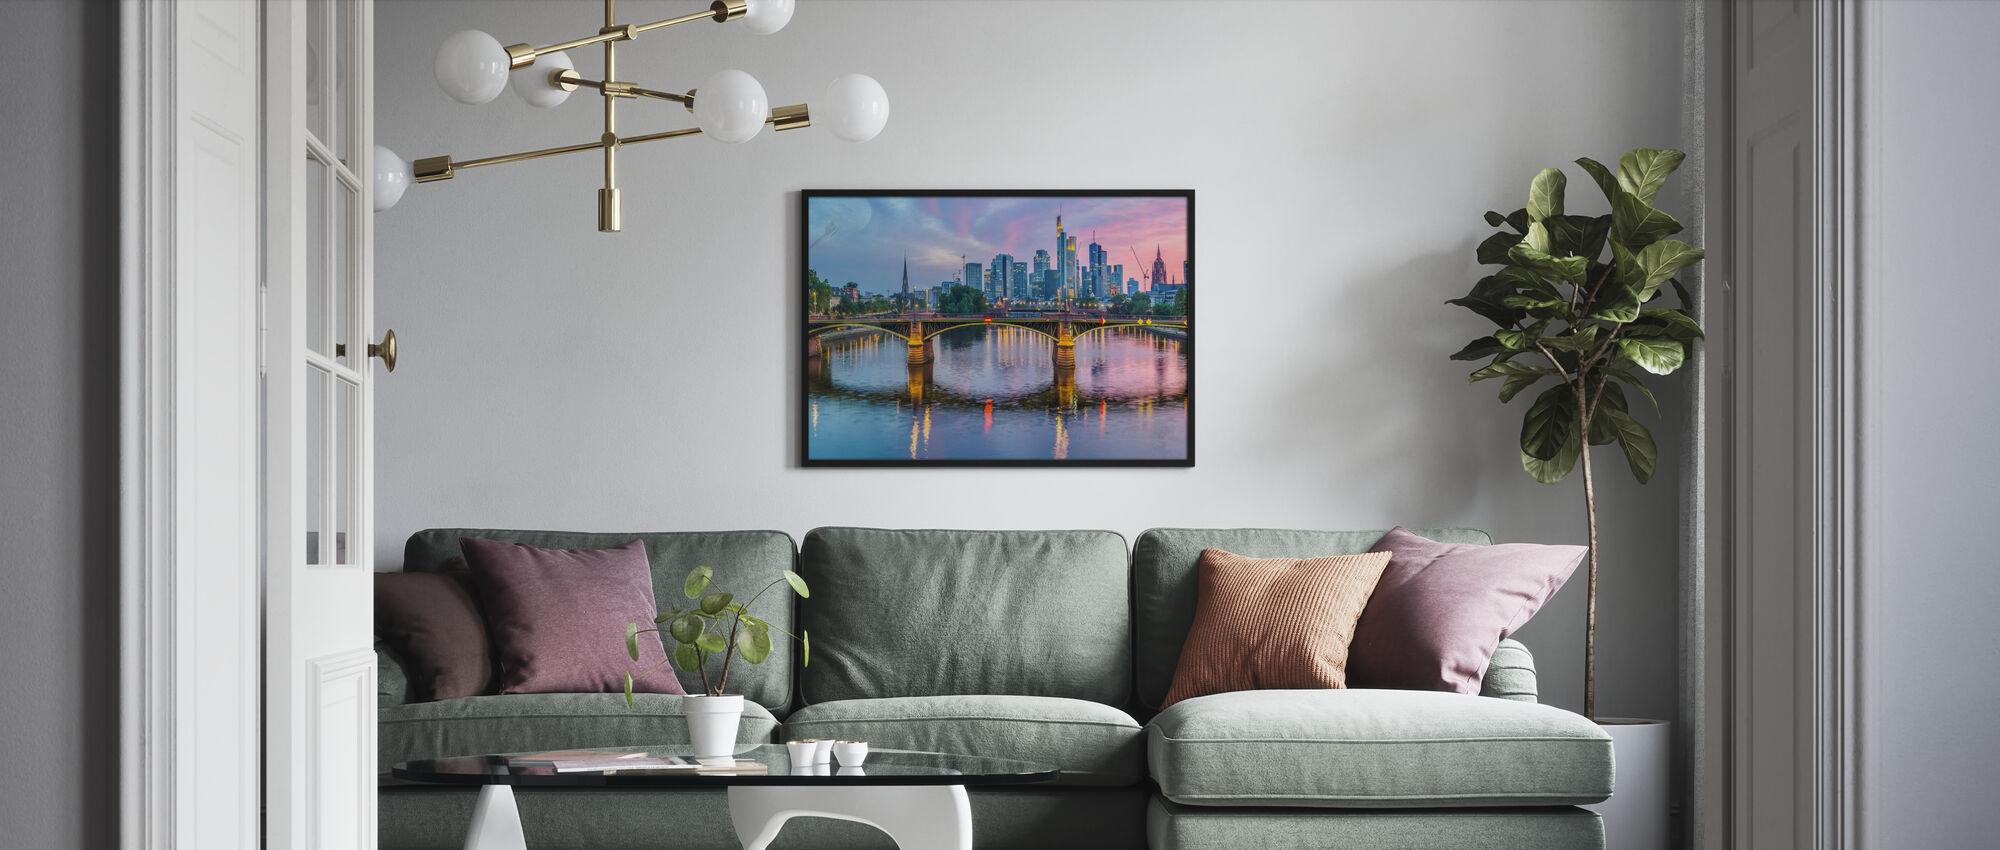 Skyline Frankfurt at Sunset - Poster - Living Room